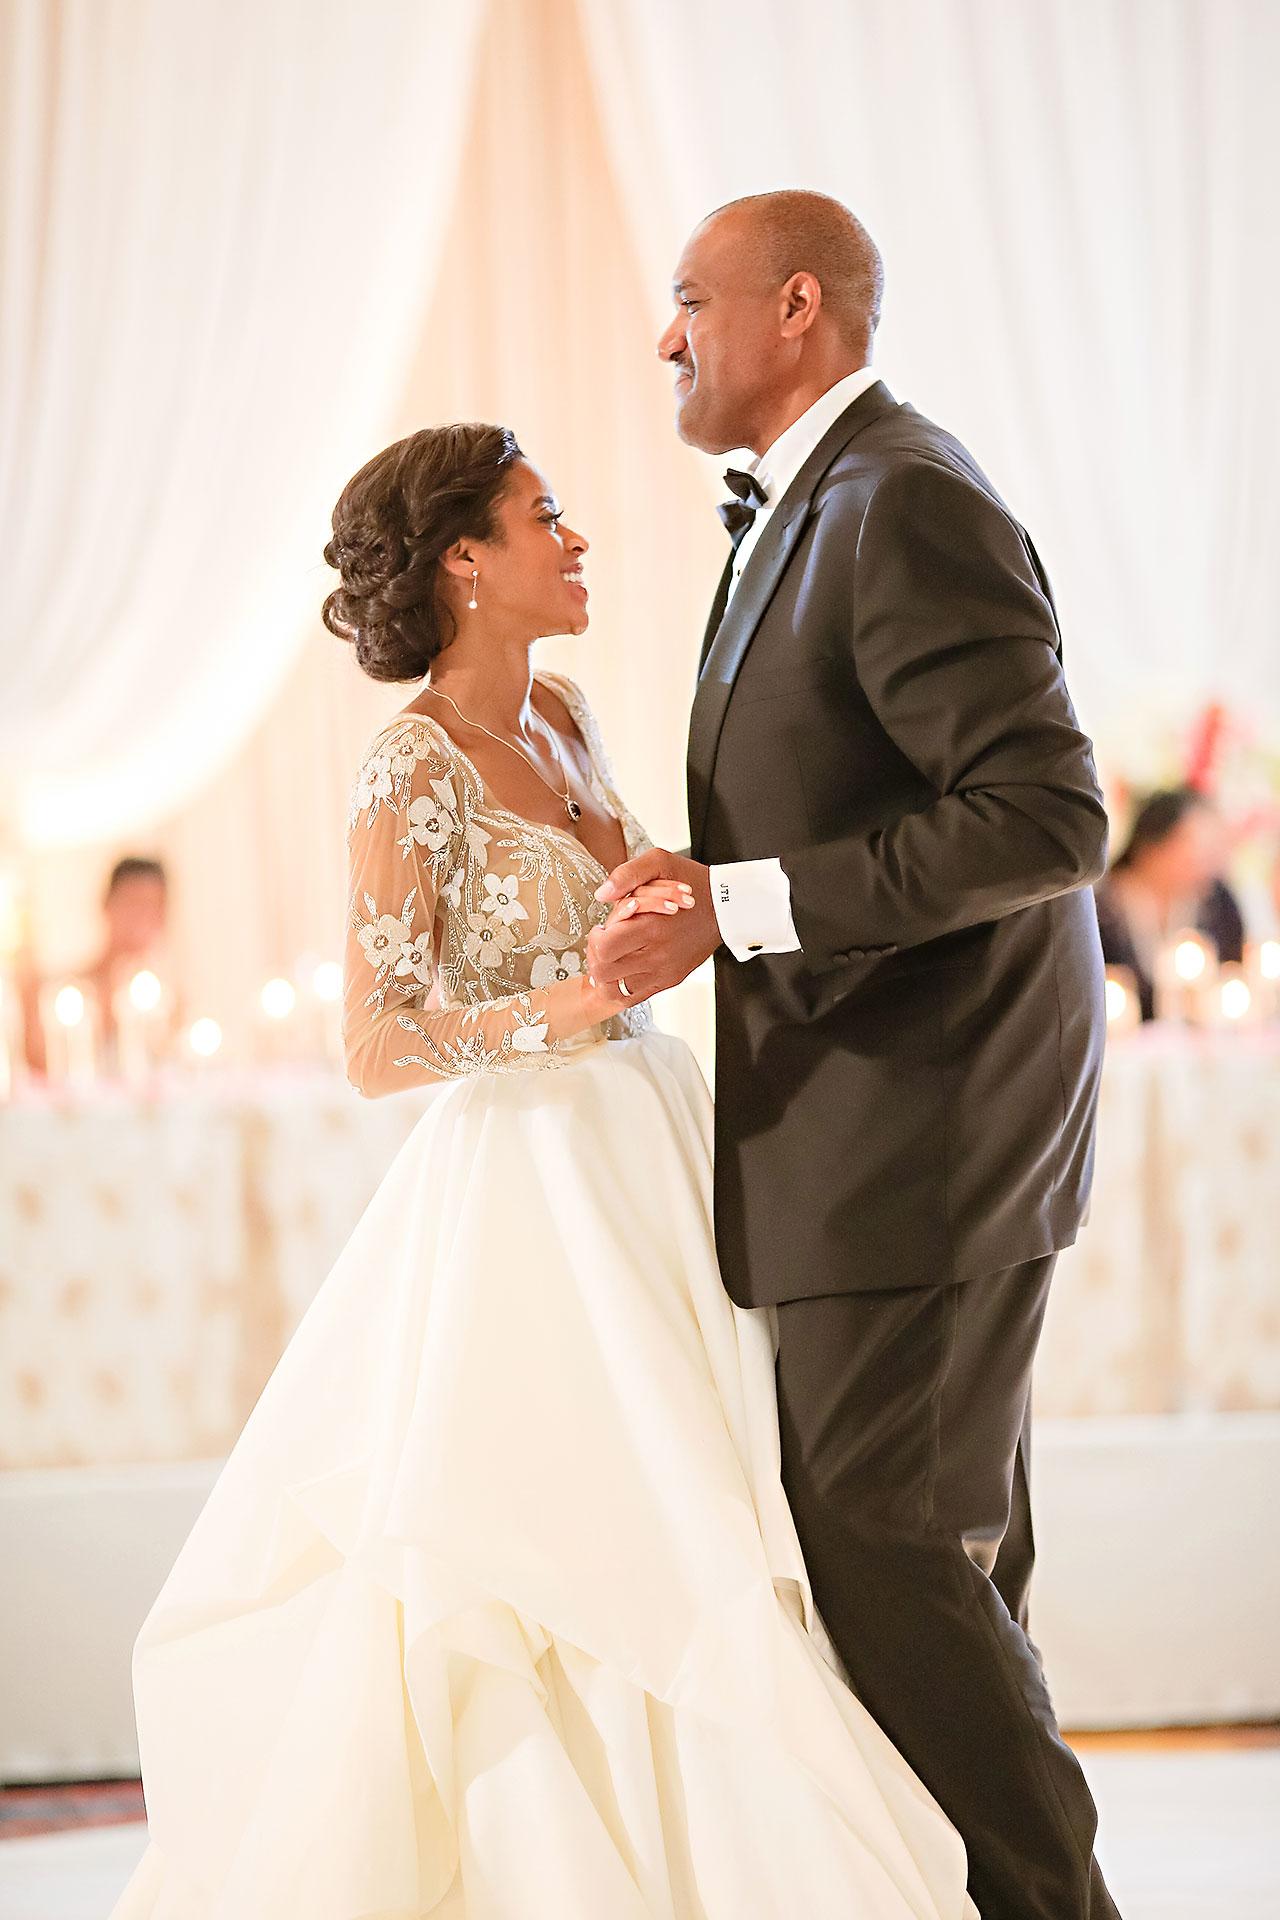 Joie Nikhil JW Marriott Indianapolis Wedding 137